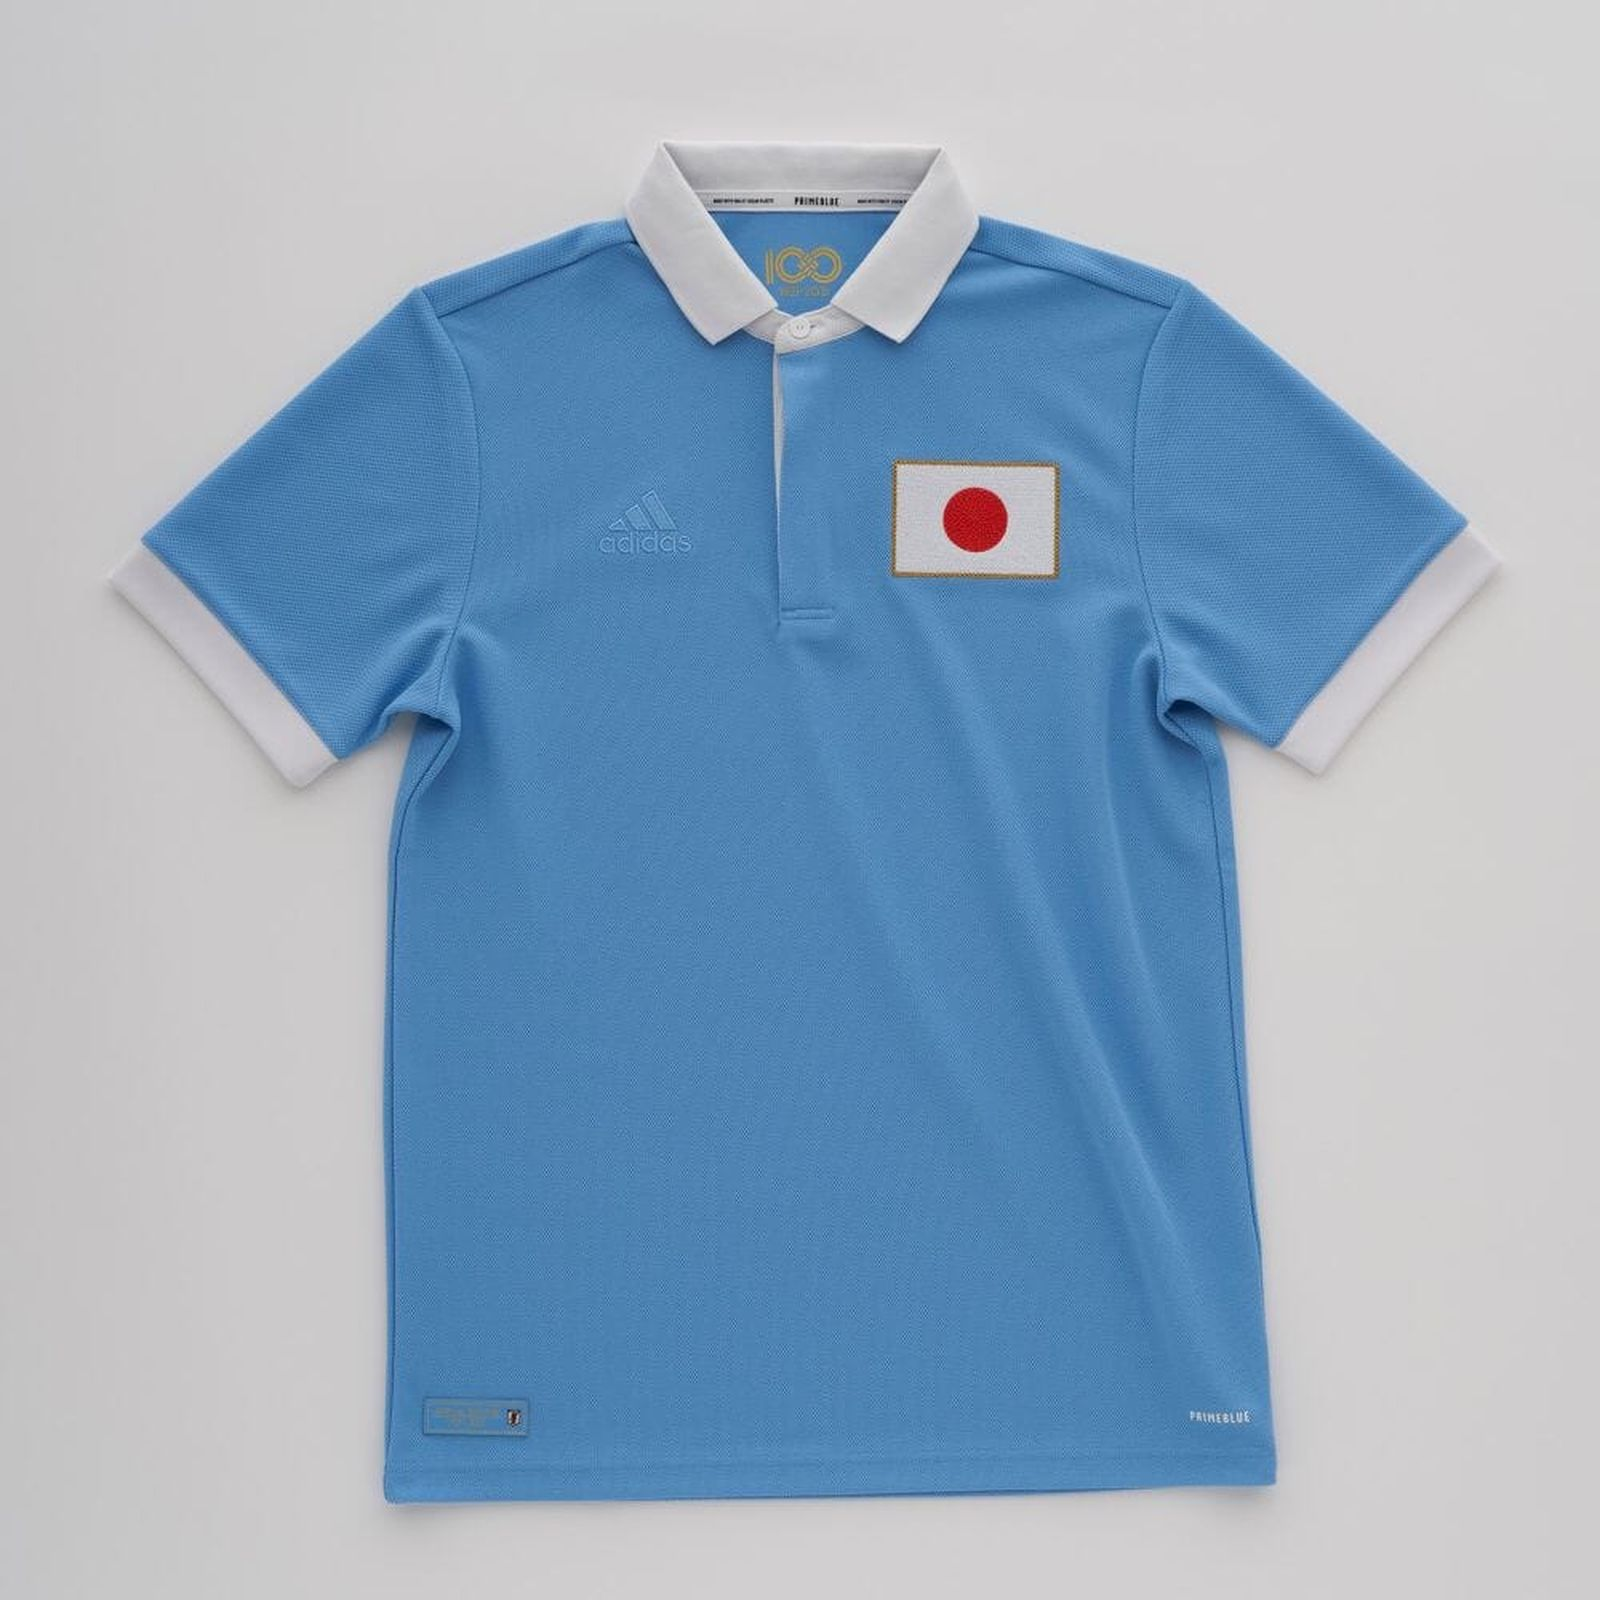 adidas-japan-anniversary-shirtz-GU1929-61